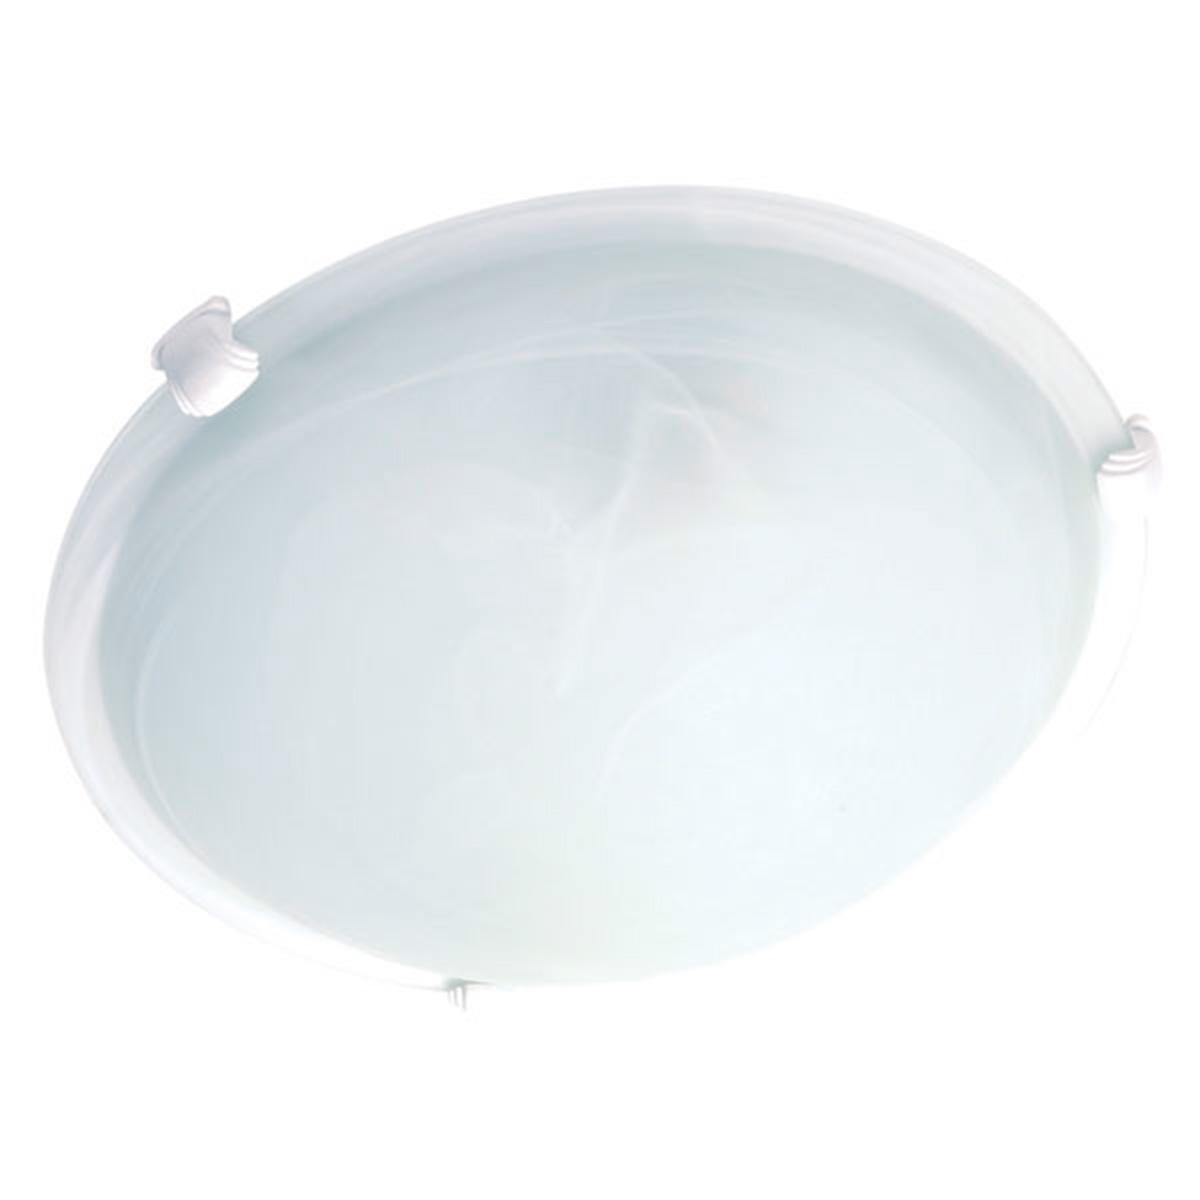 Plafon Murano Vidro 40cm 3 Lampadas E-27 Max 60w Cor Branco Com Garra Branca